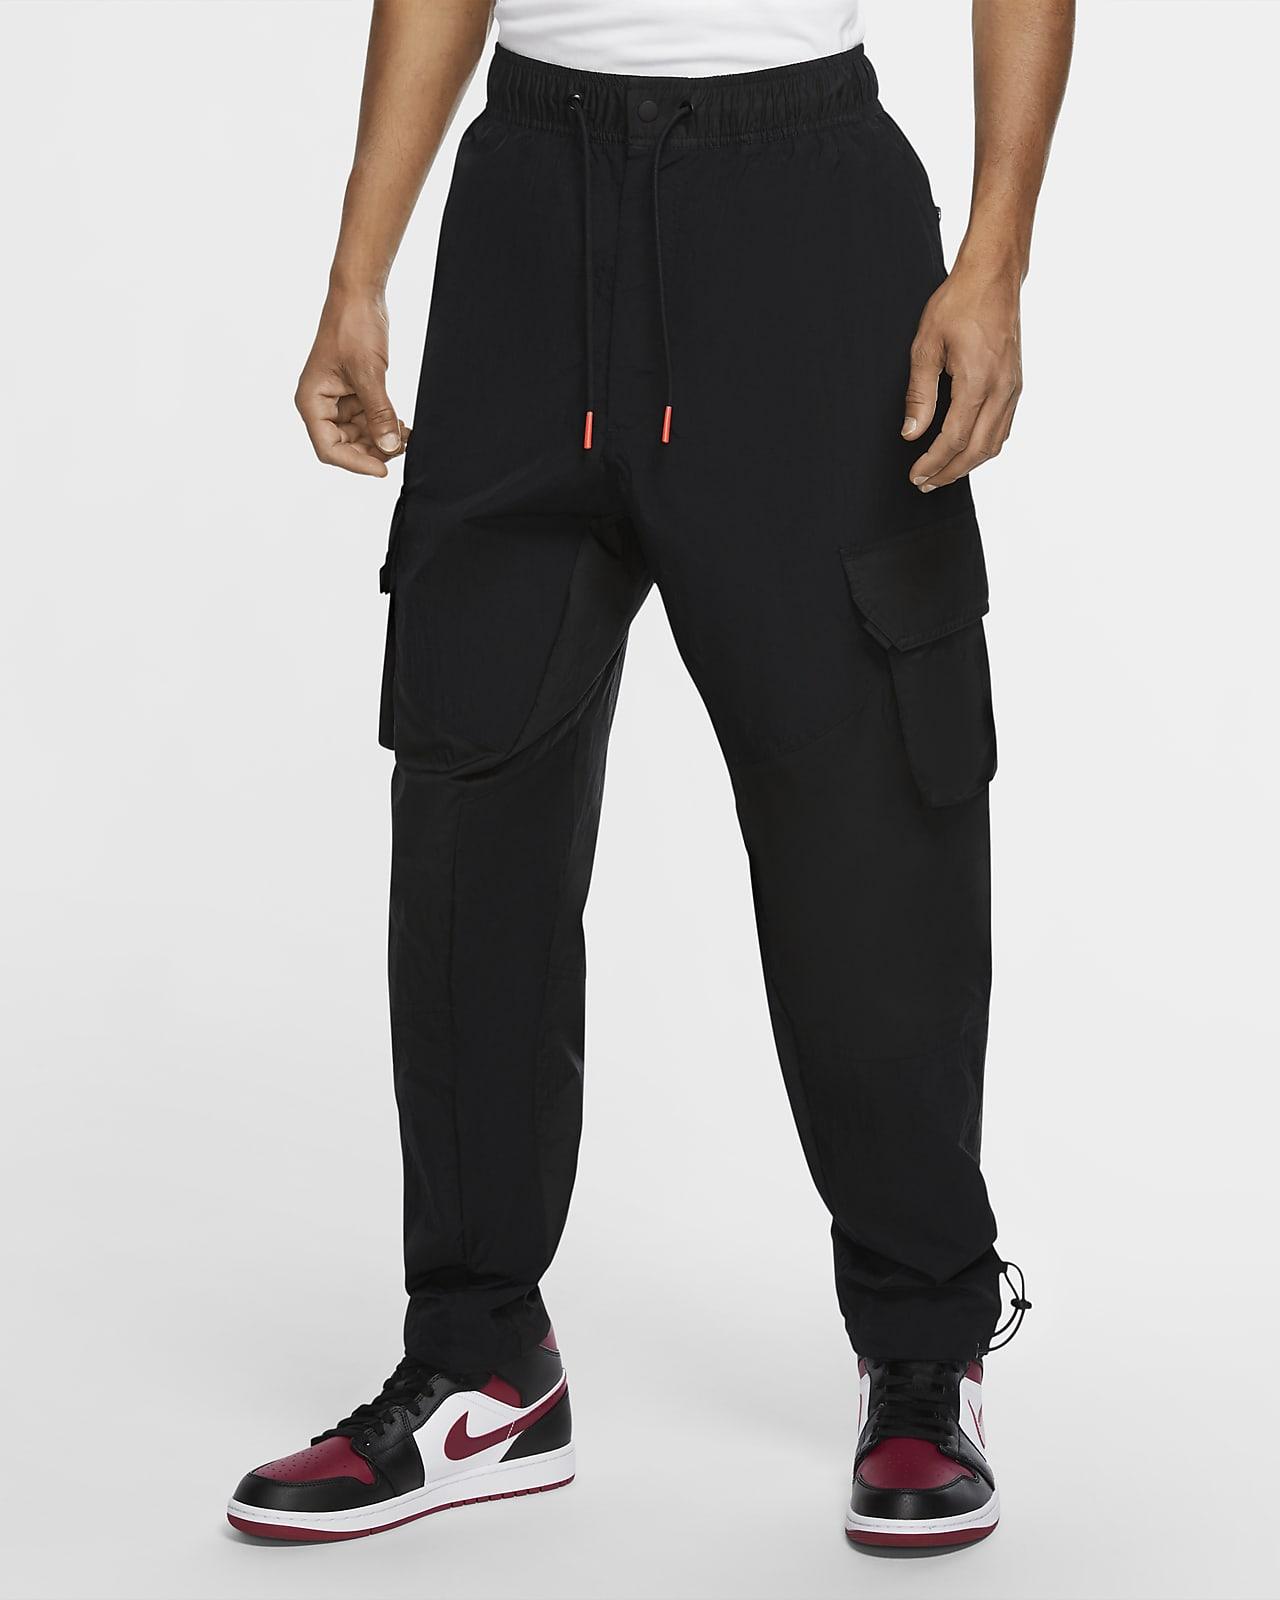 Pantalon cargo Jordan 23 Engineered pour Homme